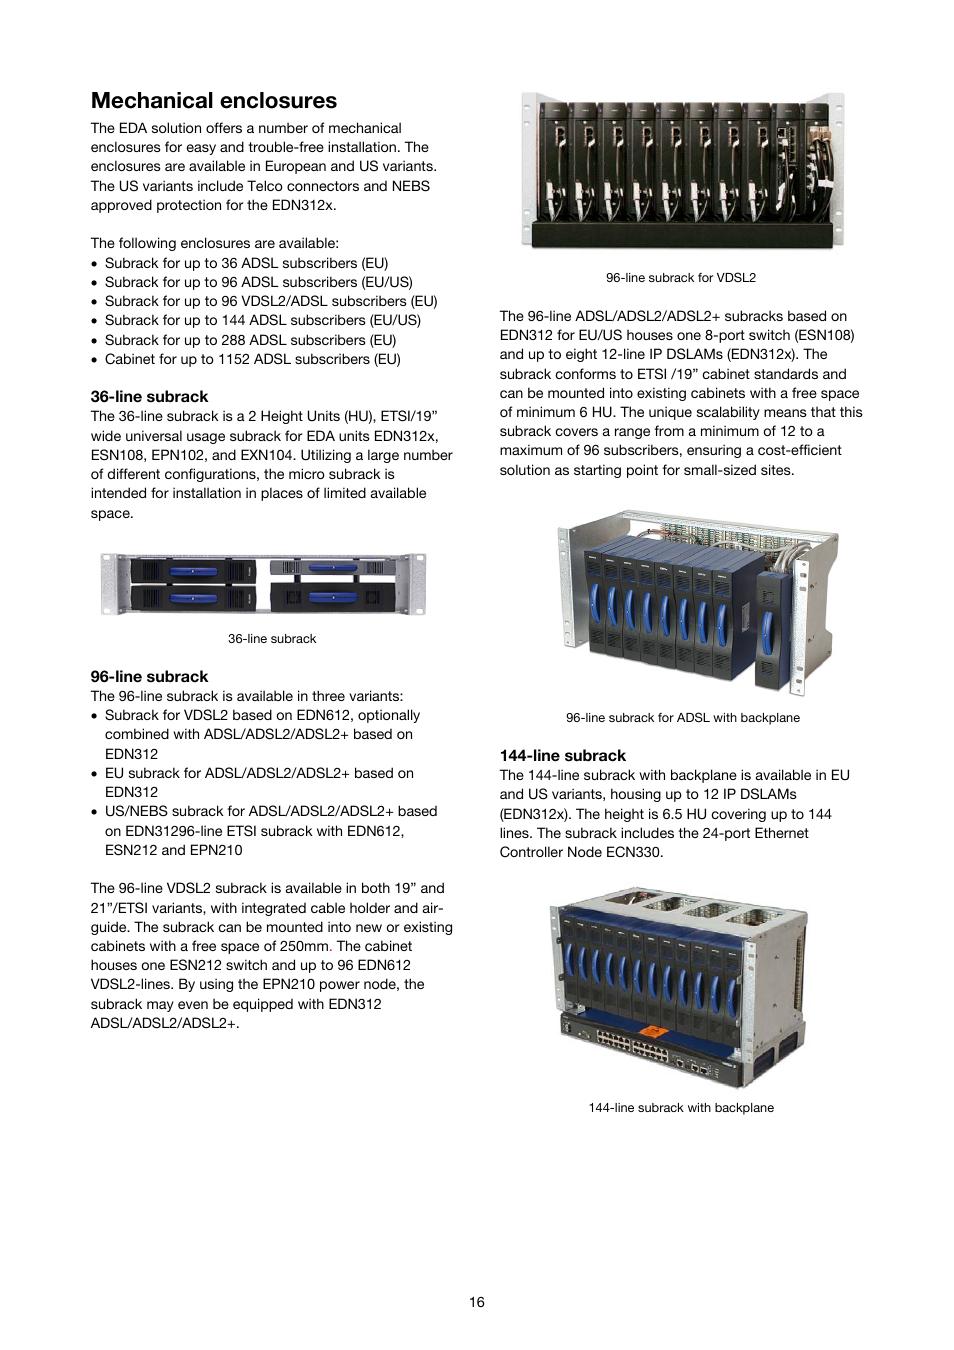 mechanical enclosures ericsson solution description eda 1200 4 0 rh manualsdir com ericsson rx8200 user manual ericsson consono md110 user manual